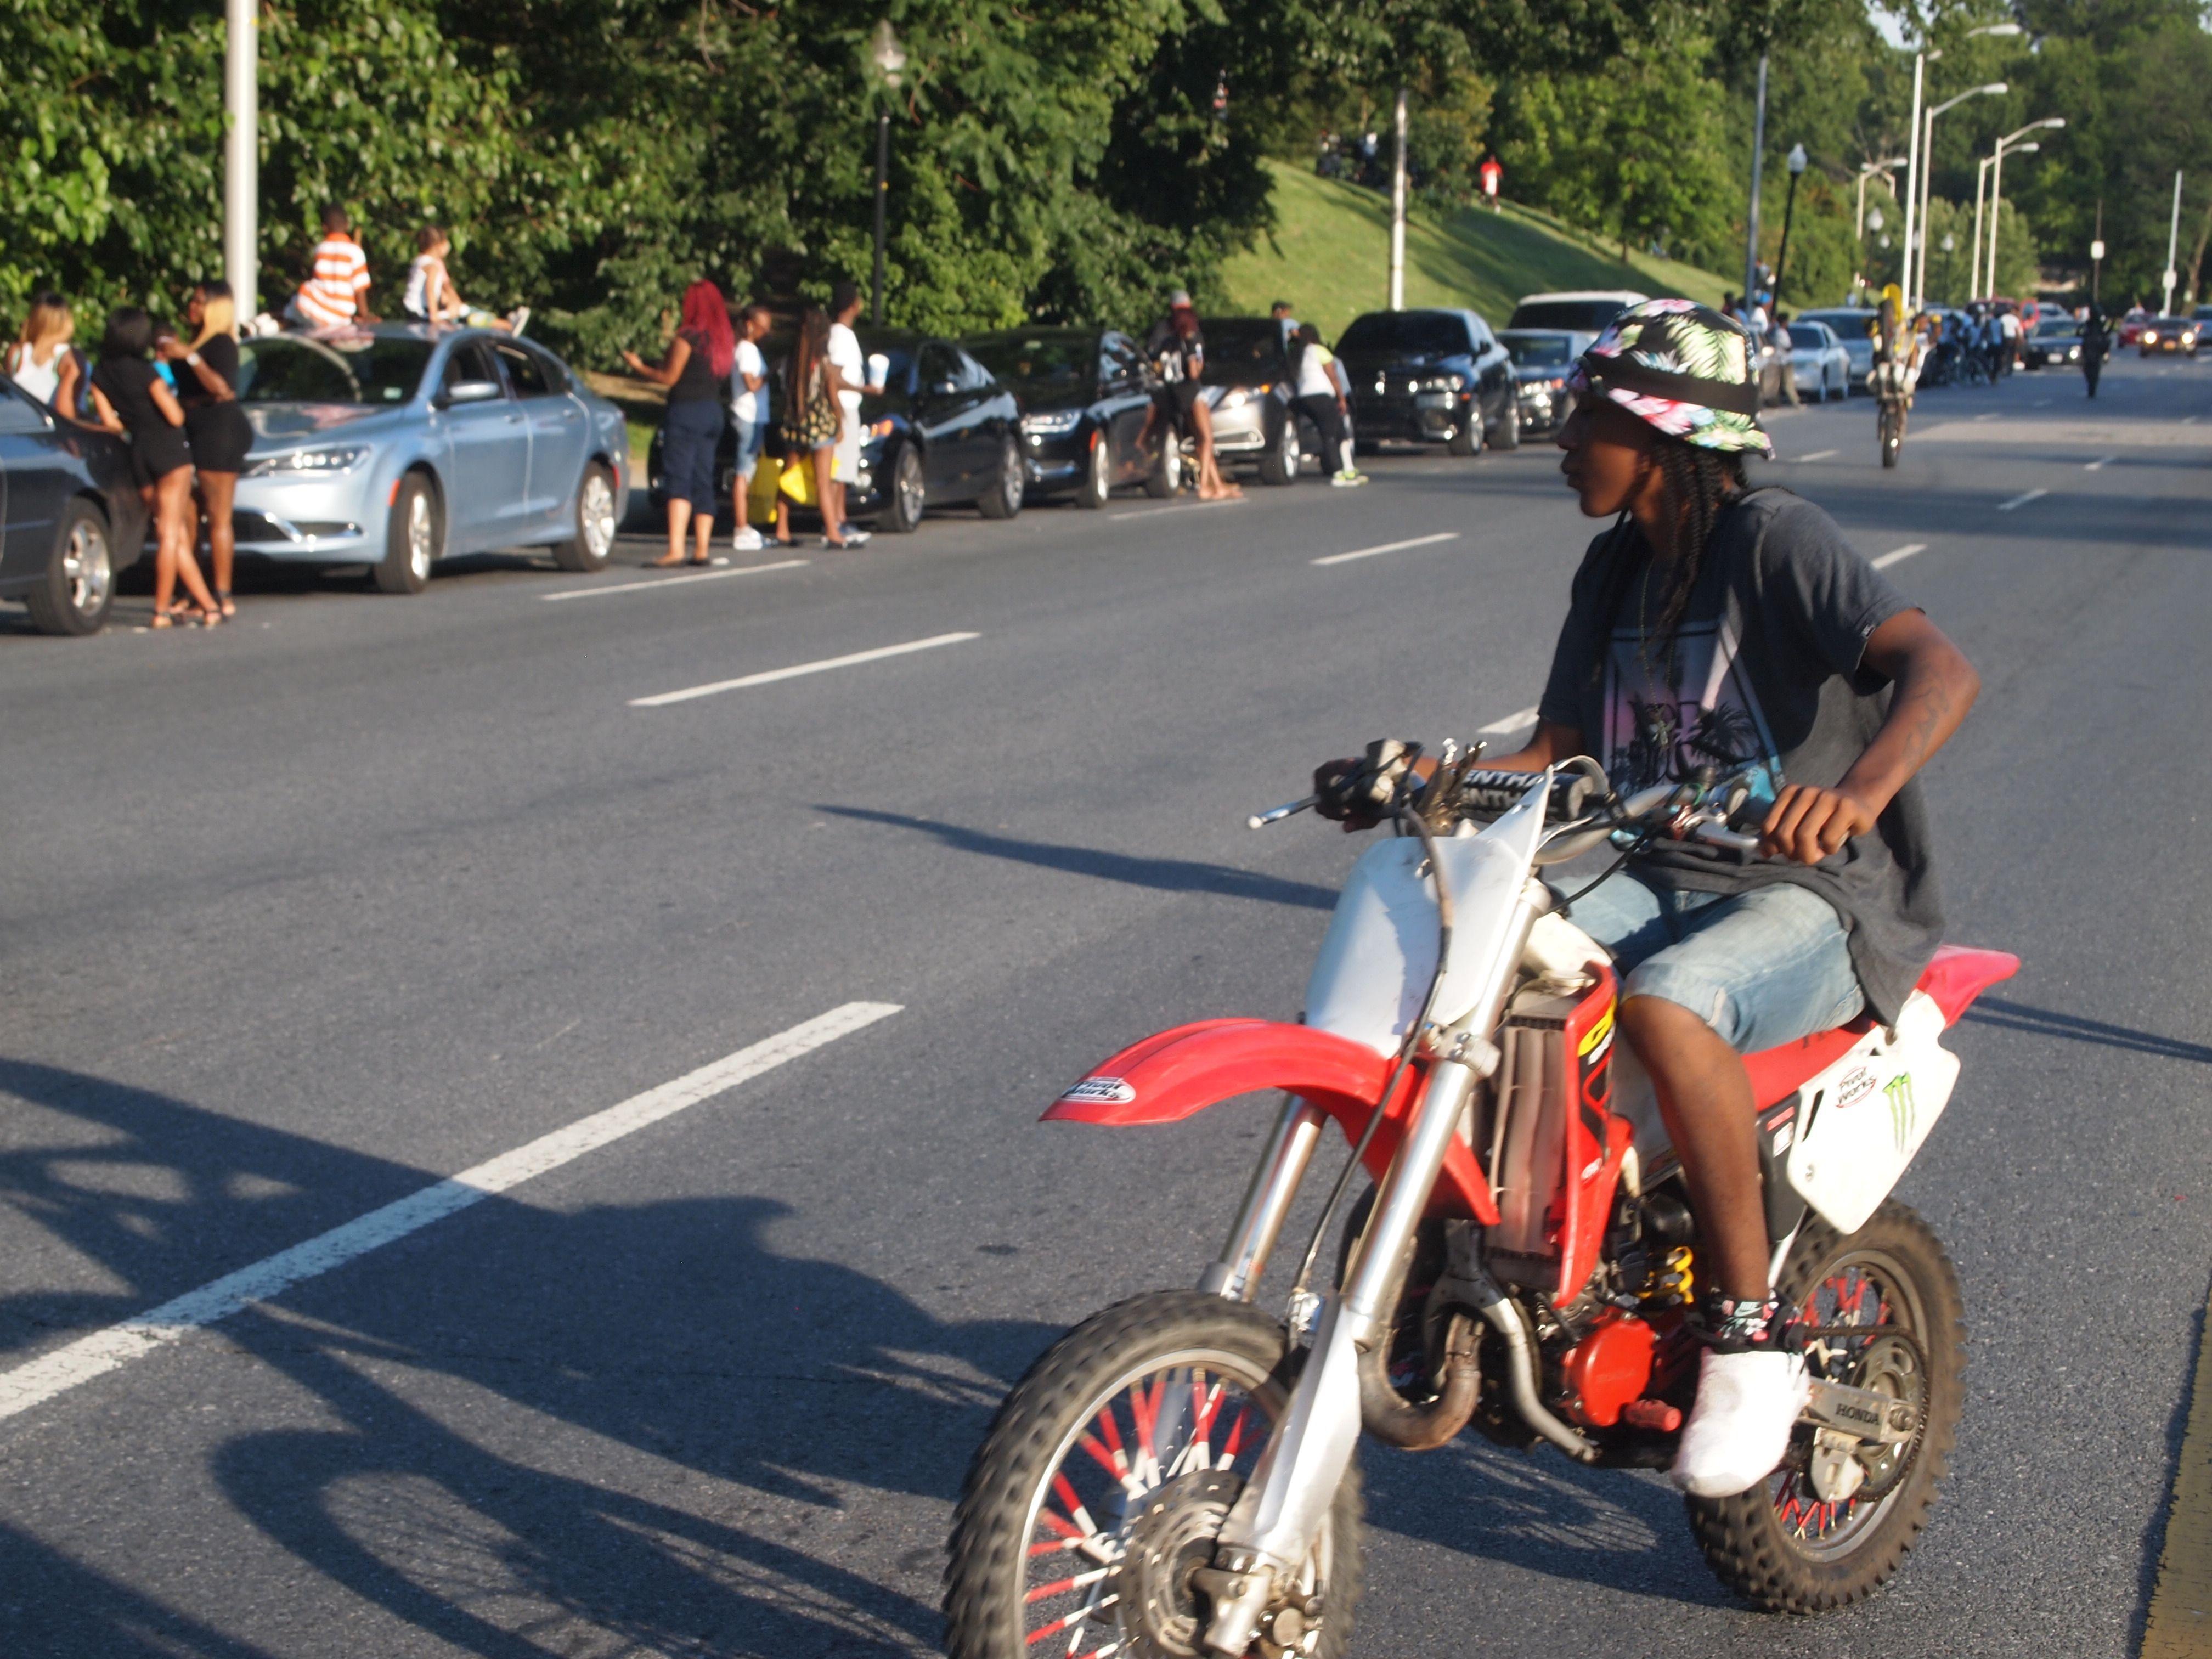 Bikerboypug Pug Bikelife Baltimore Maryland Culture